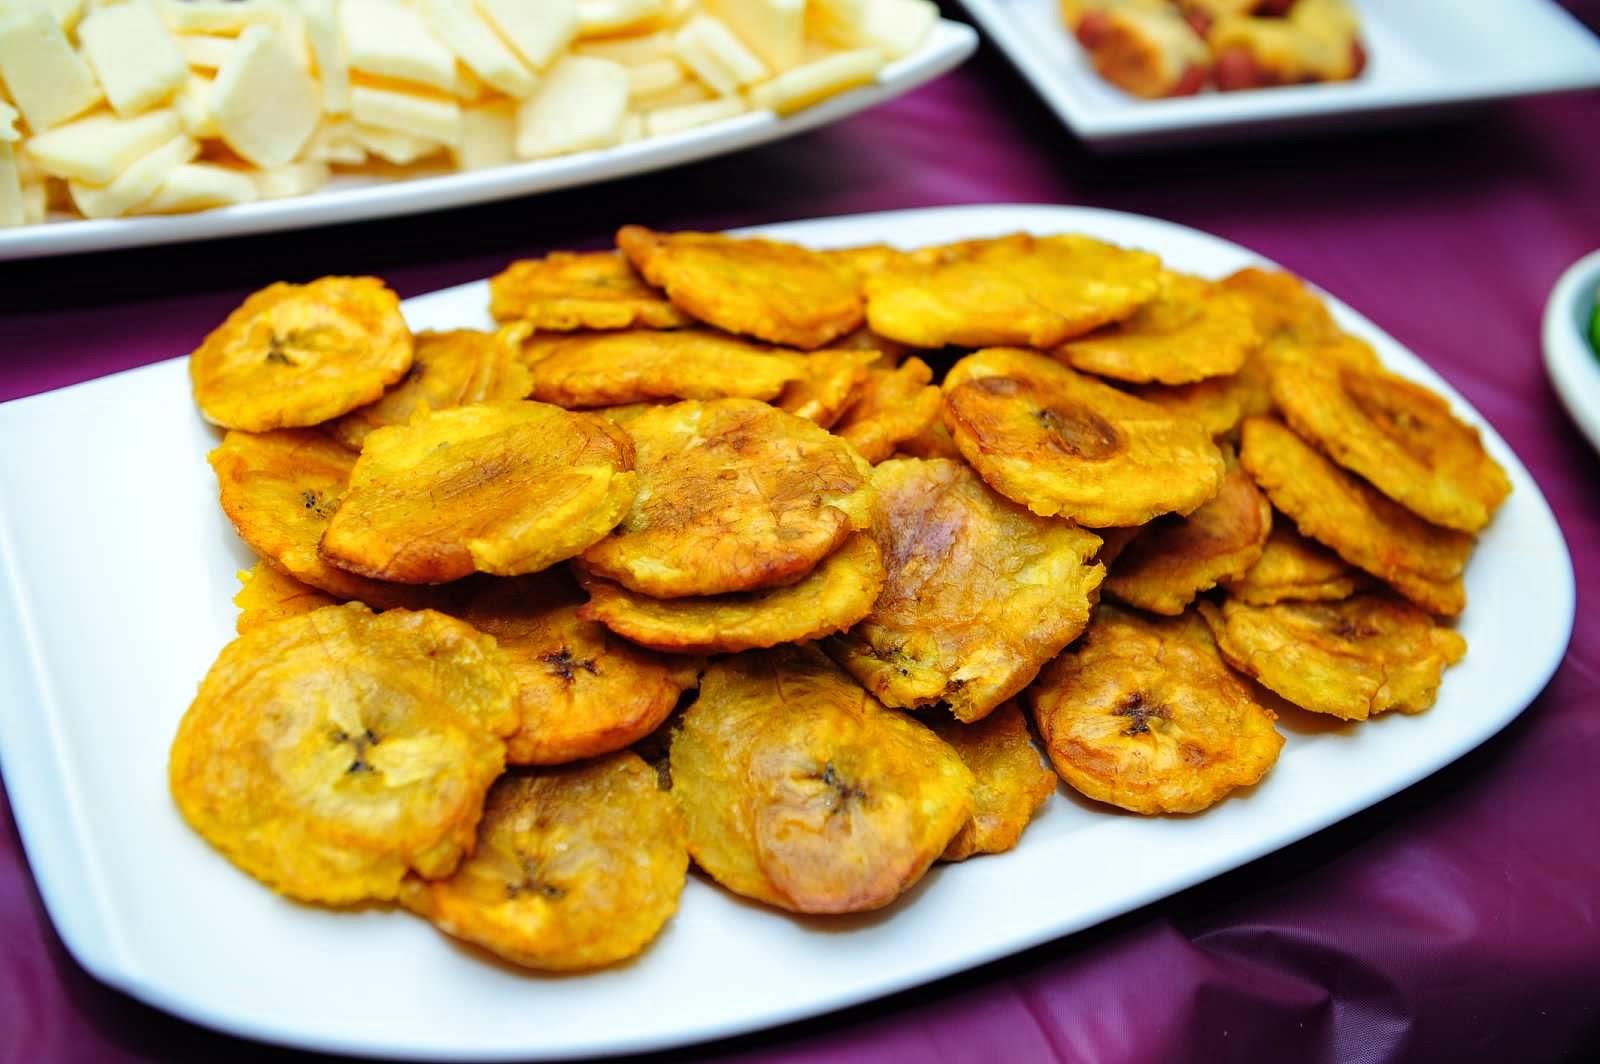 Musings of a Haitian American Male: Taso and Banan Peze